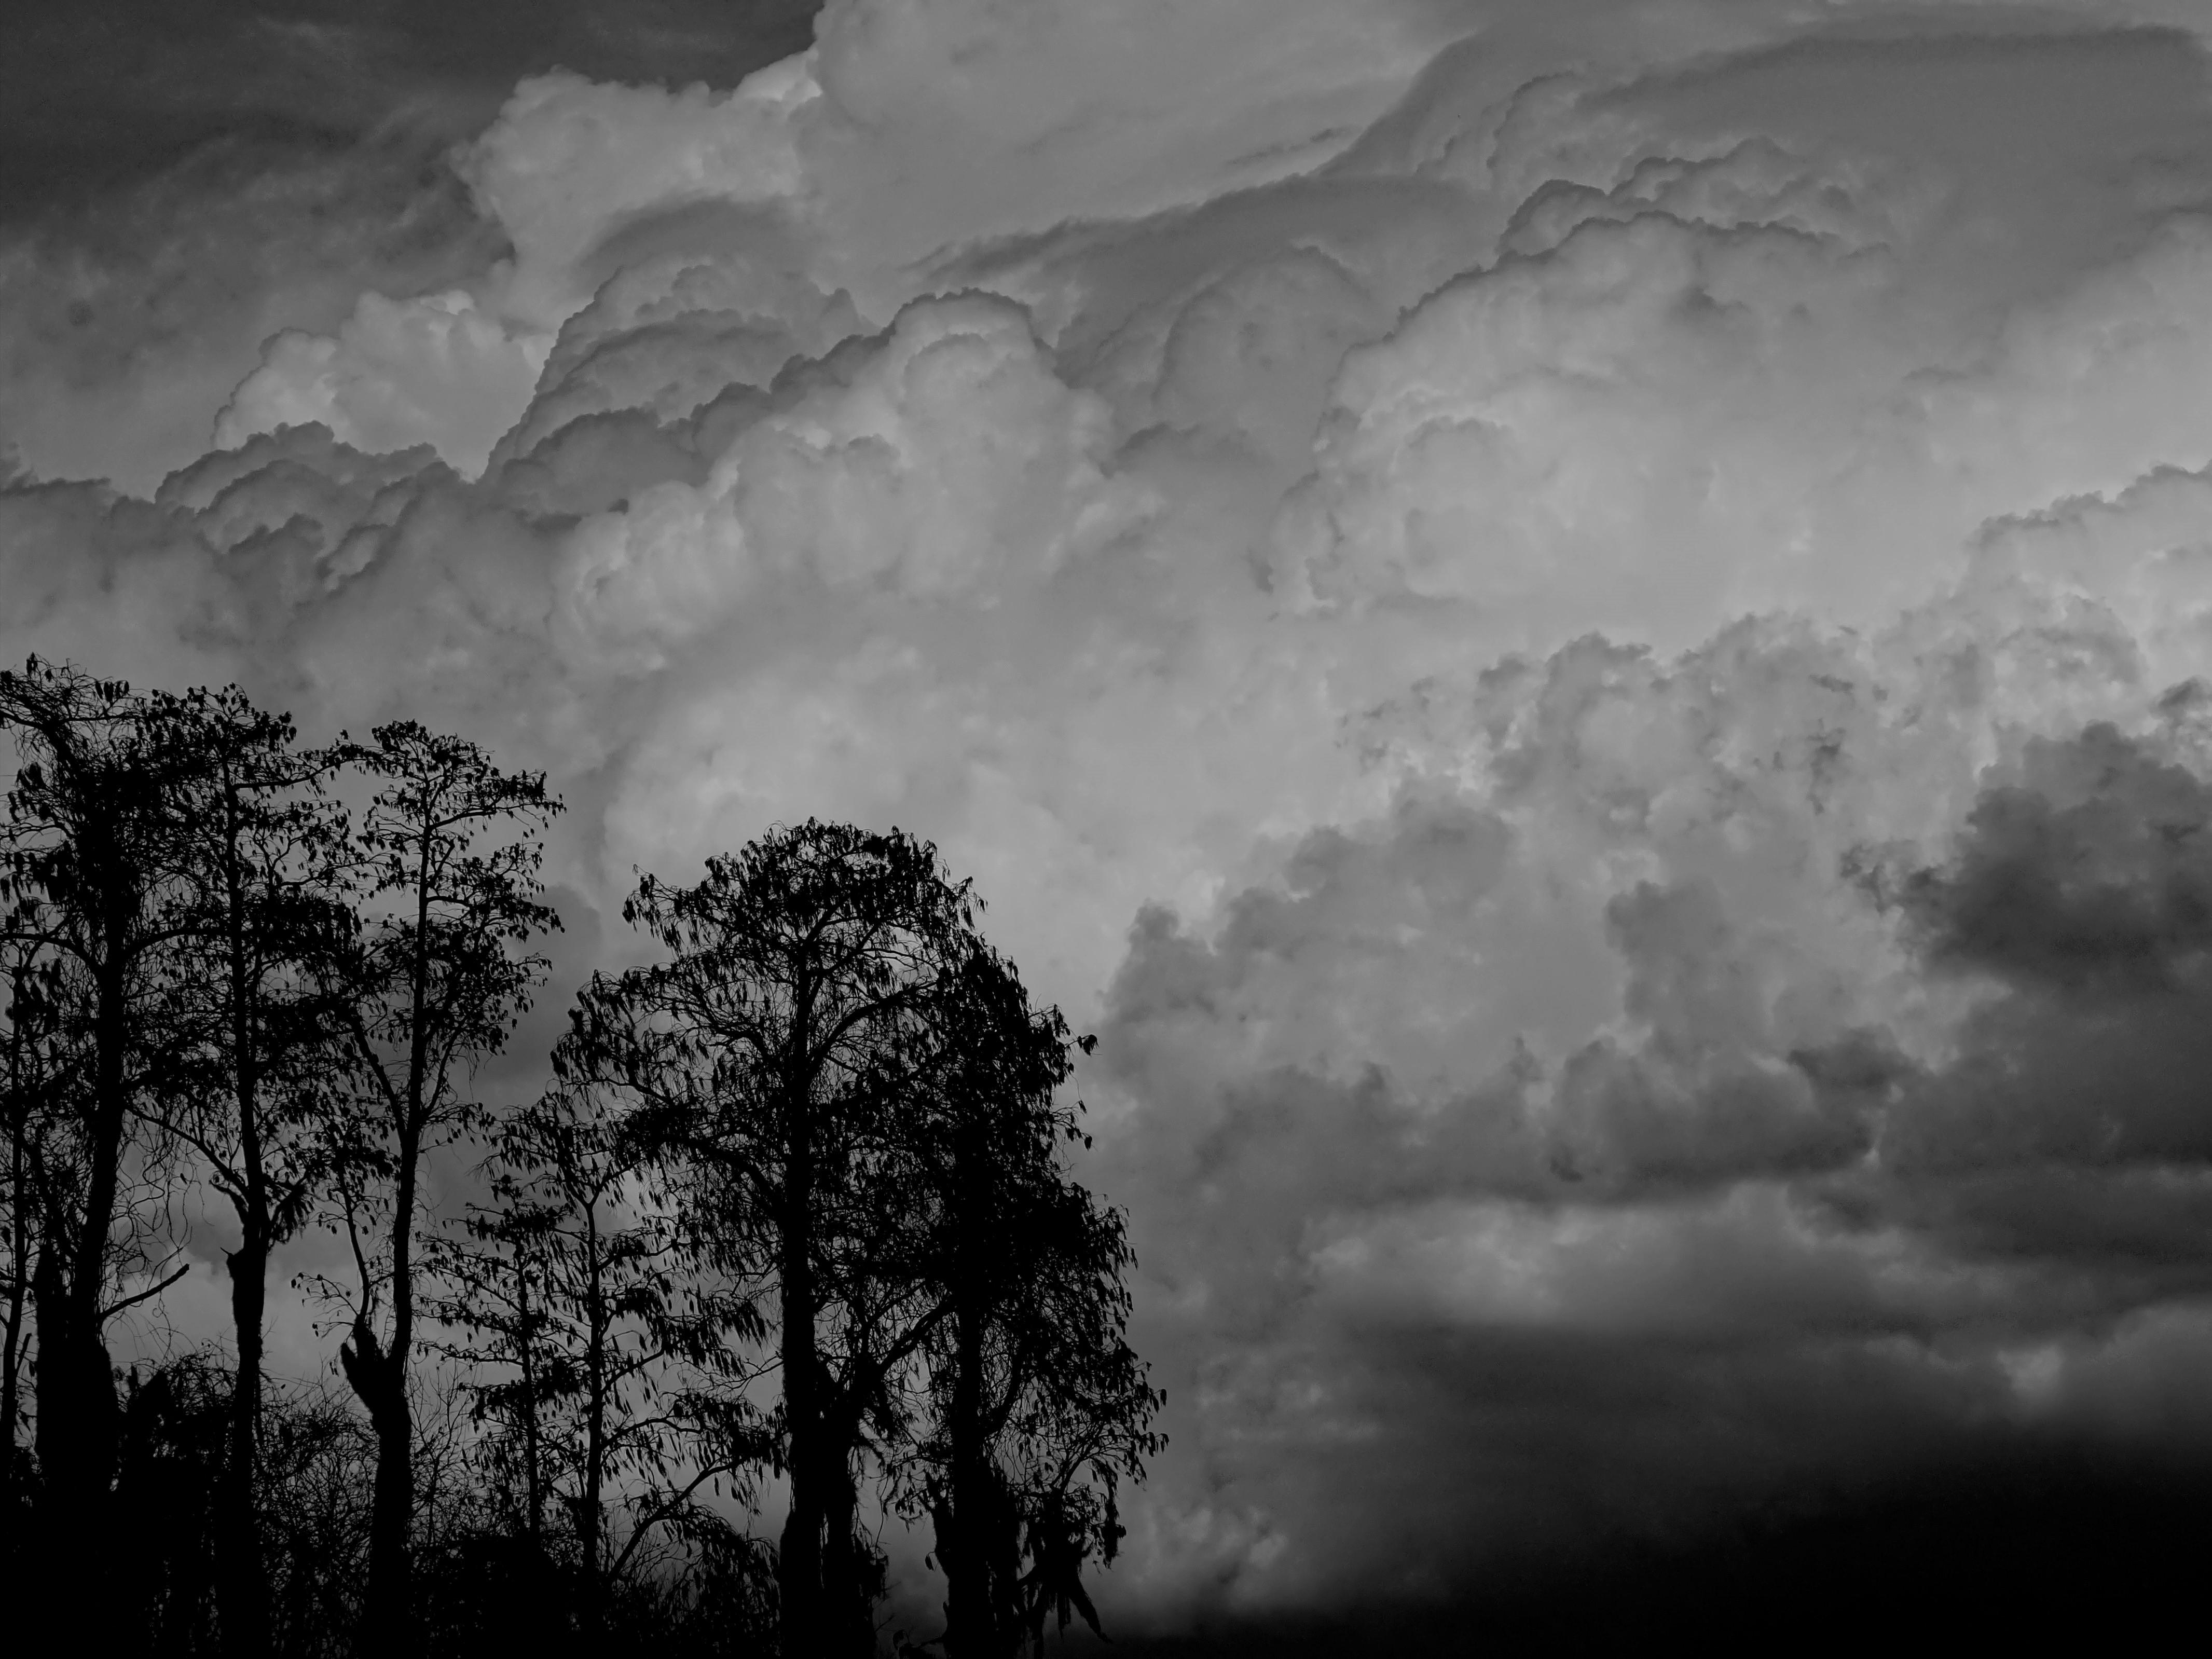 008 (4) B&W clouds.jpg